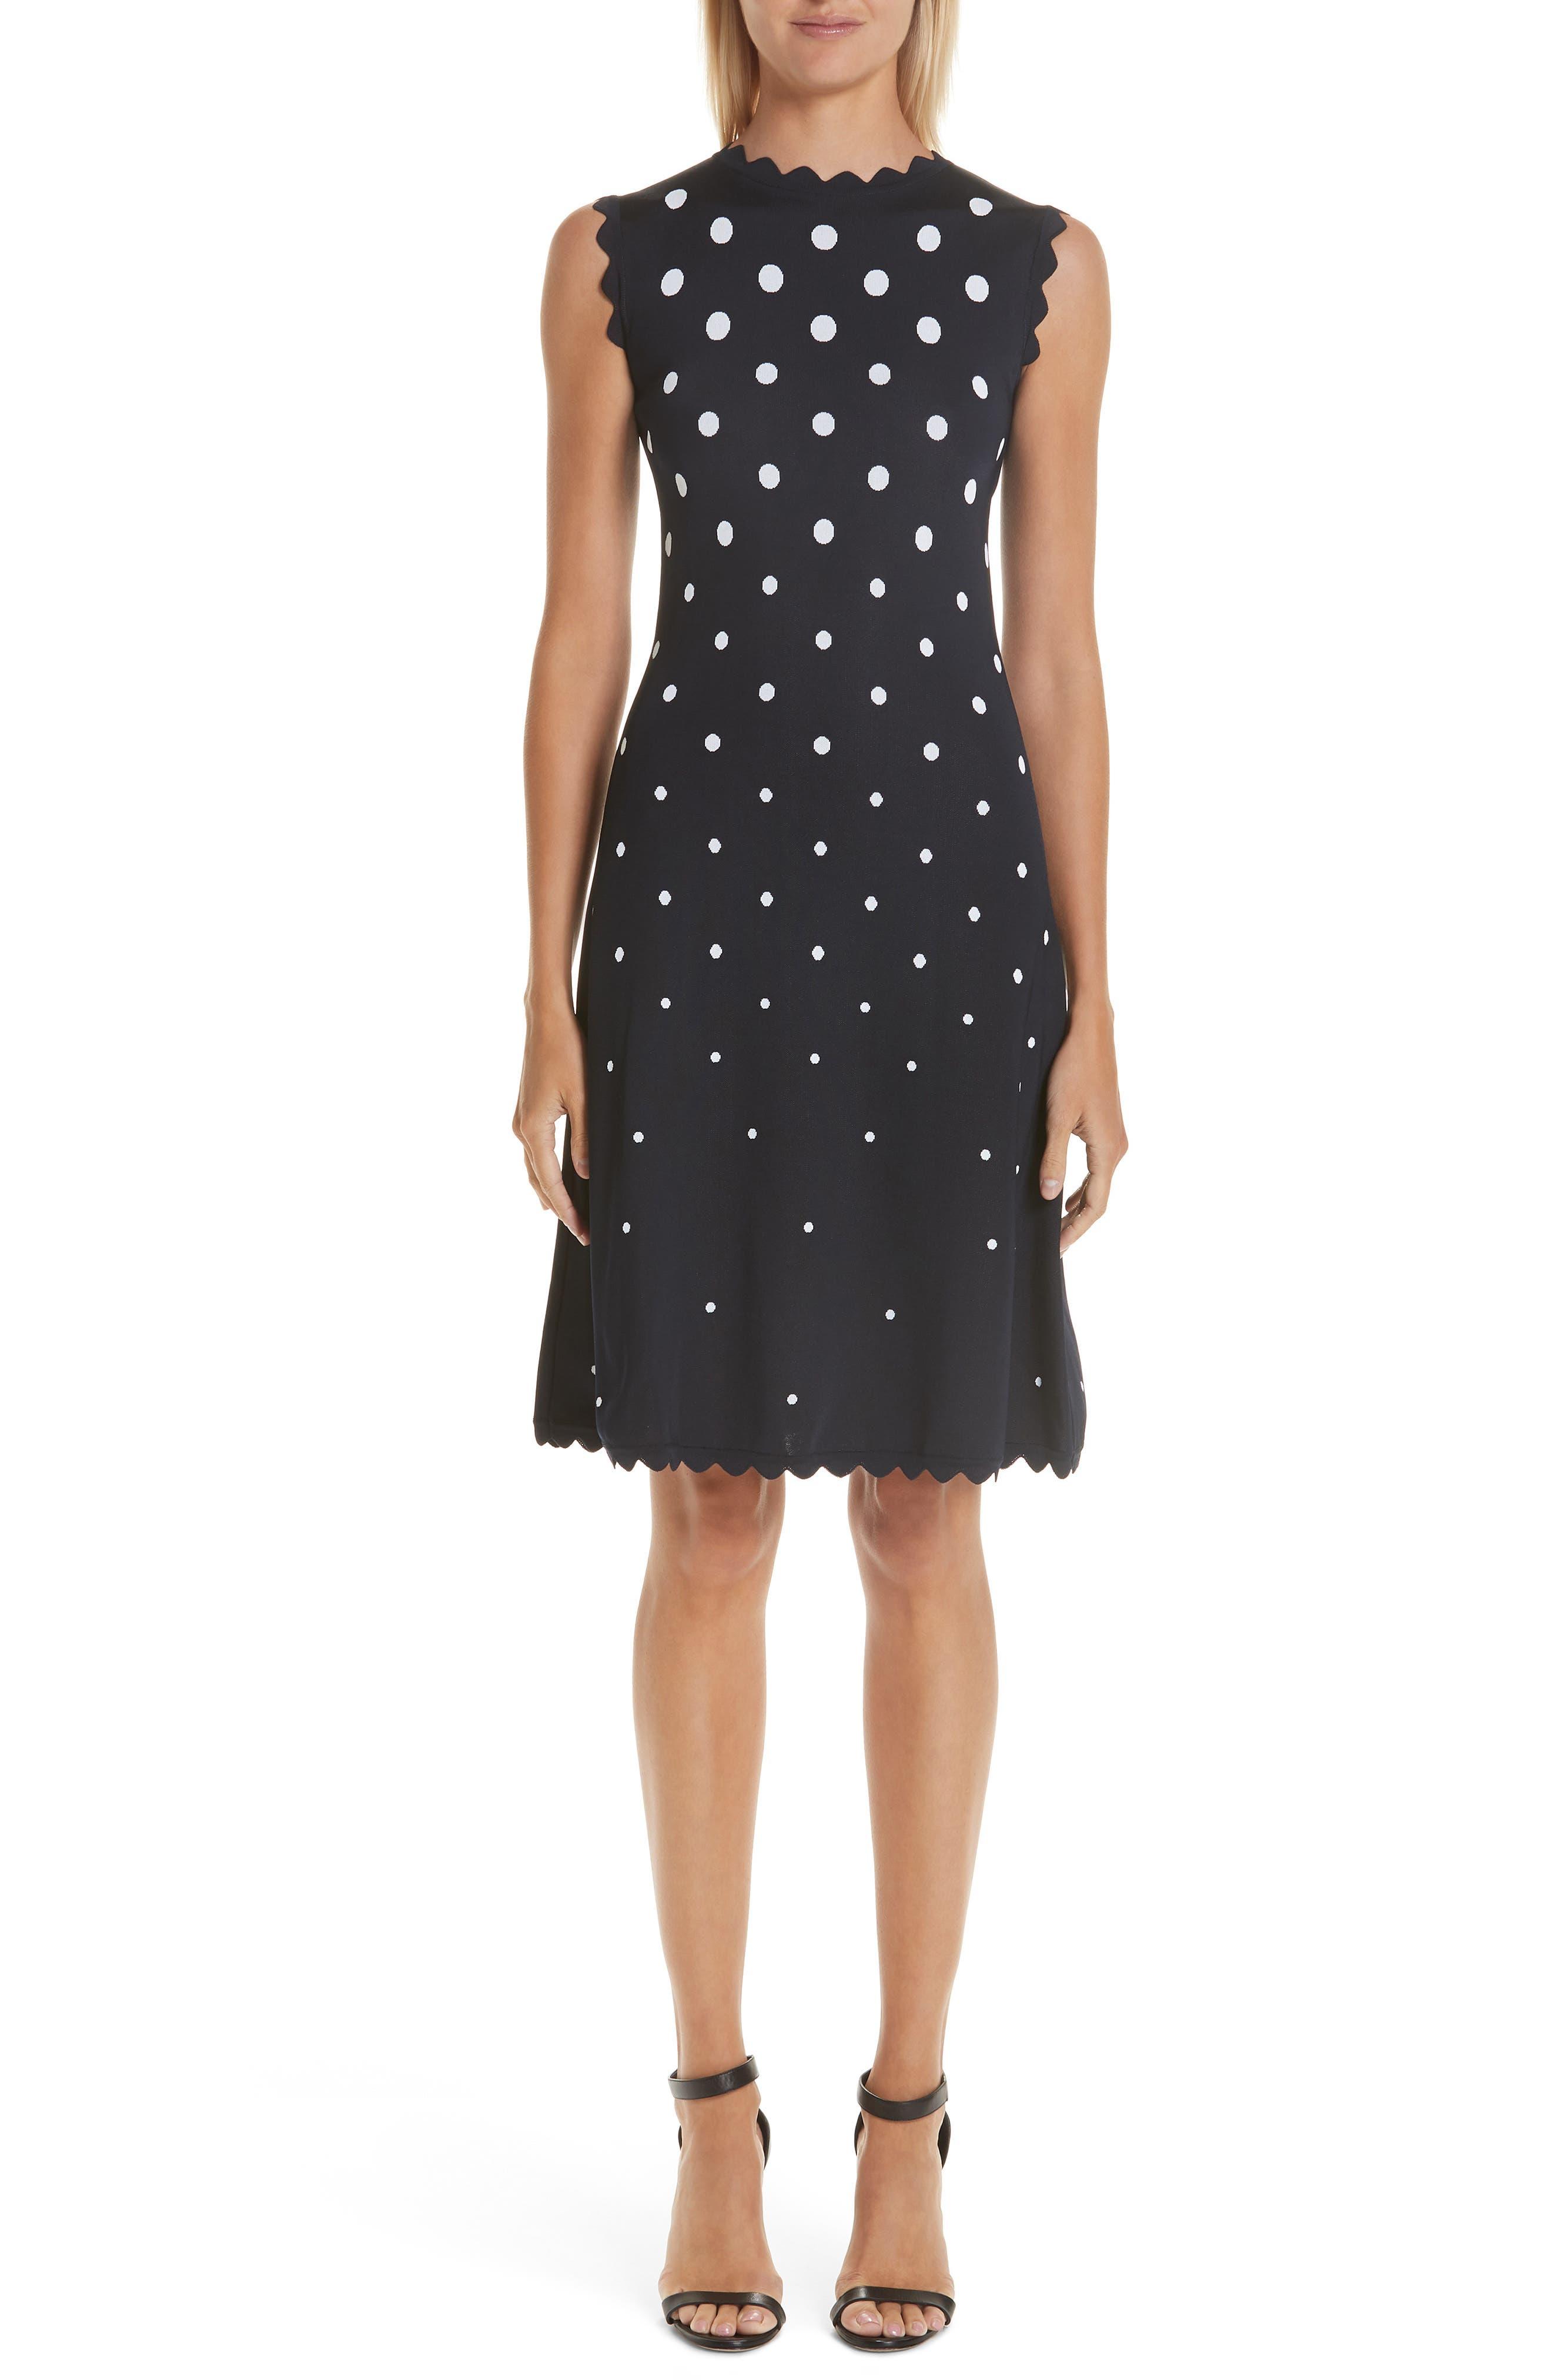 Scallop Edge Polka Dot A-Line Dress,                             Main thumbnail 1, color,                             NVW-NAVY/ WHITE